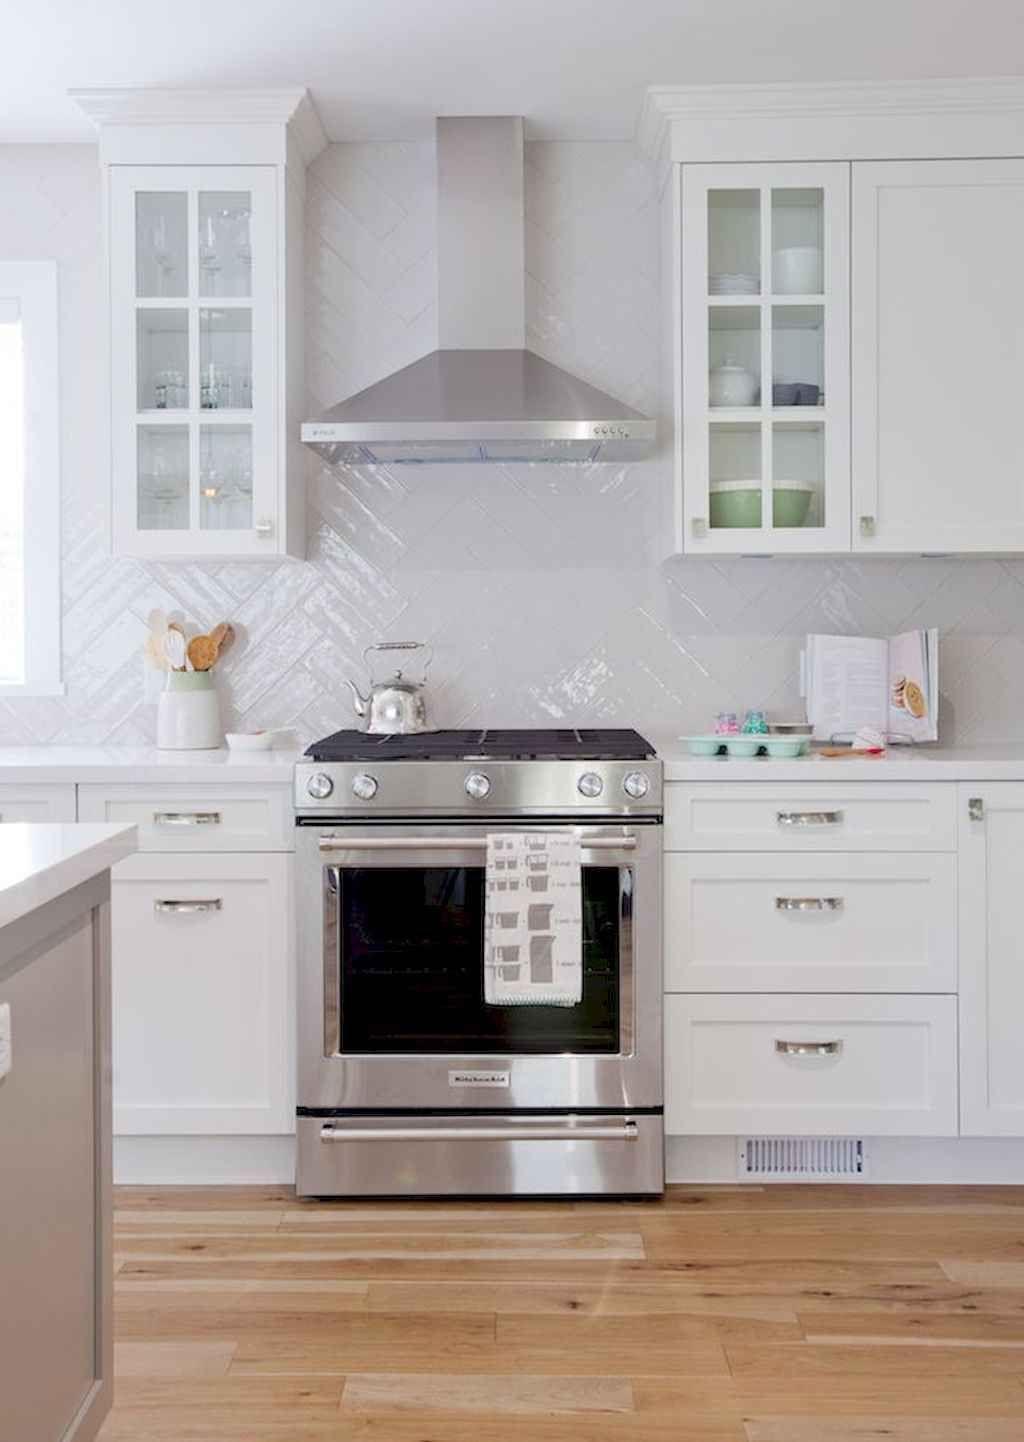 12 Amazing White Kitchen Backsplash Ideas | Kitchen ...